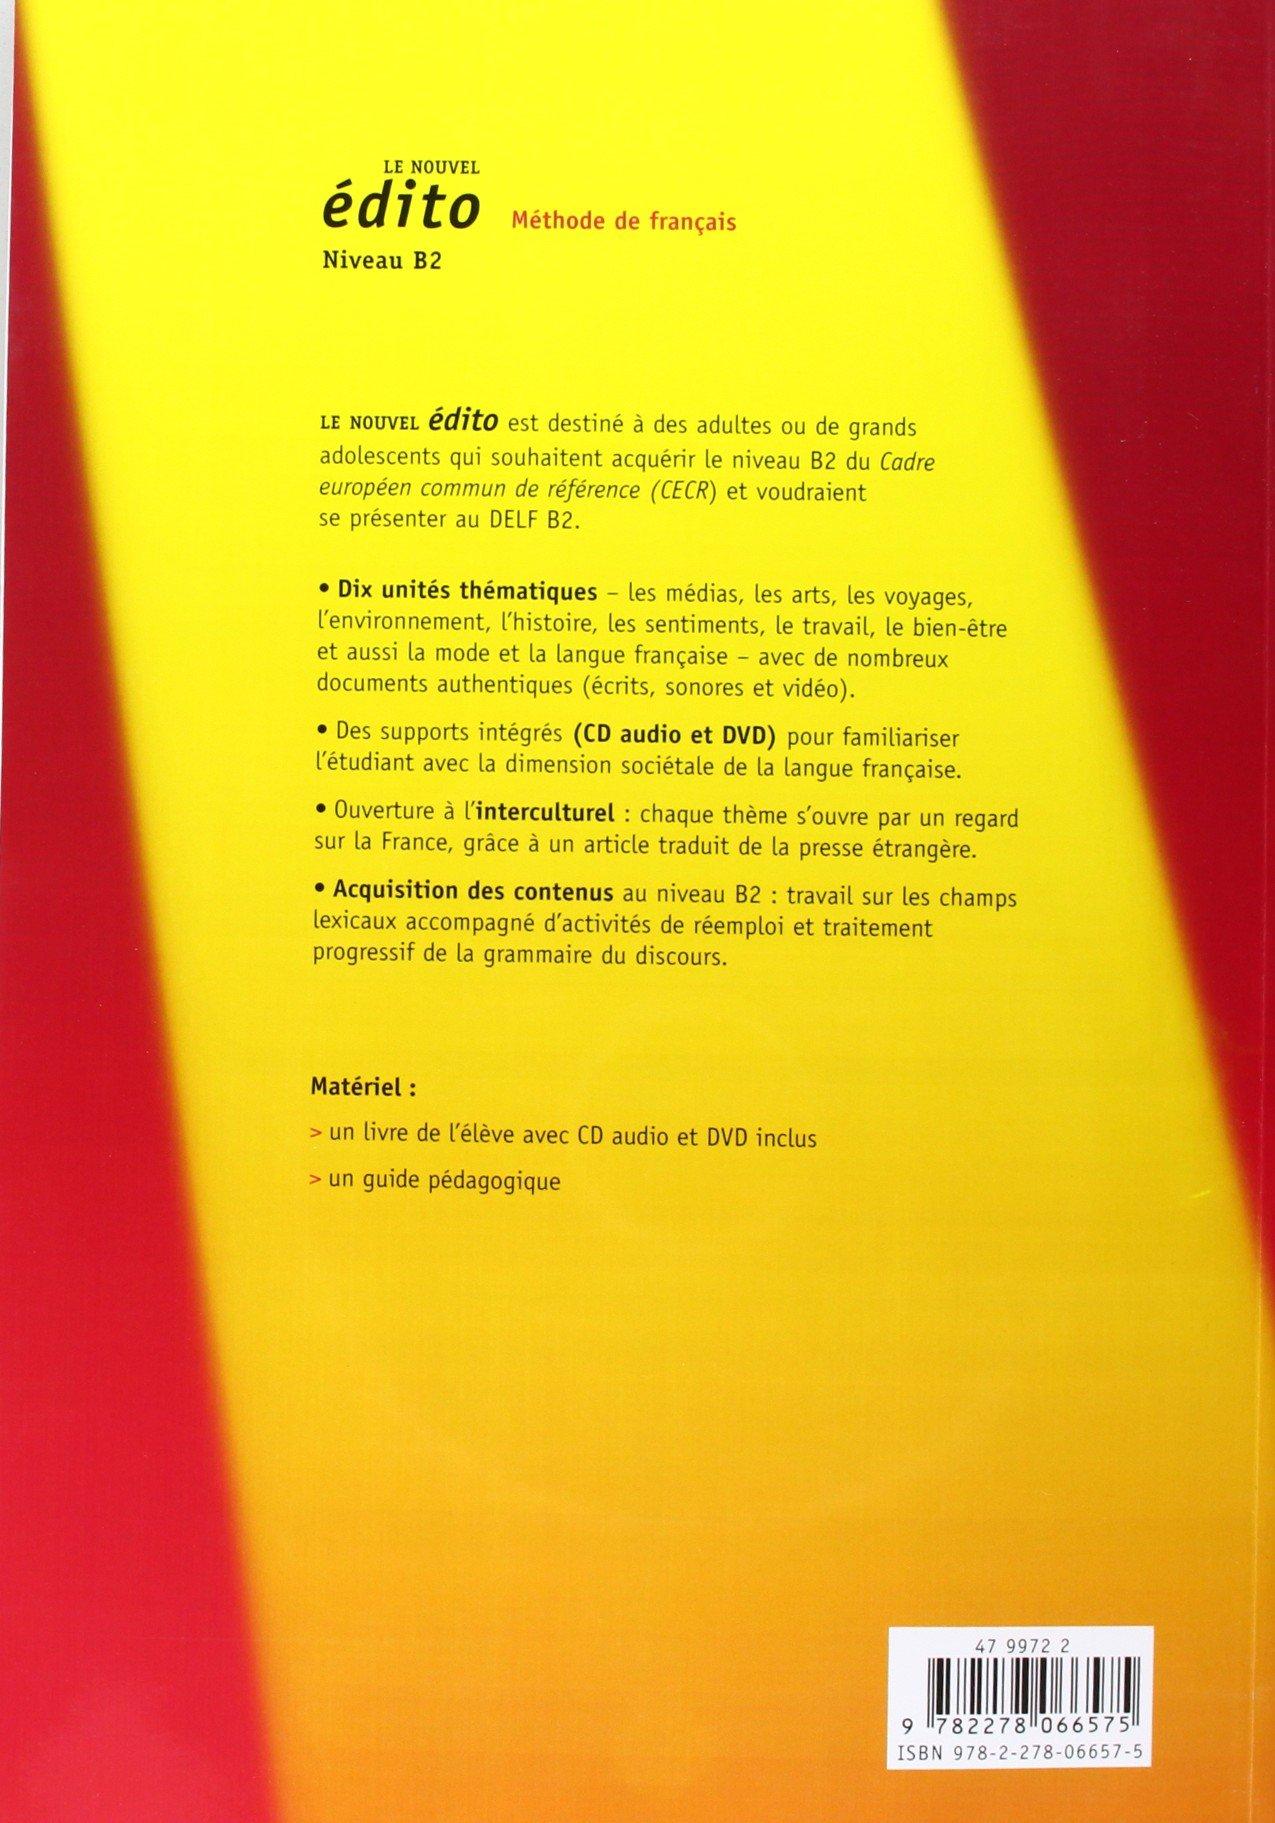 Nouvel Edito Niveau B2 Livre Cd Dvd New Ed French